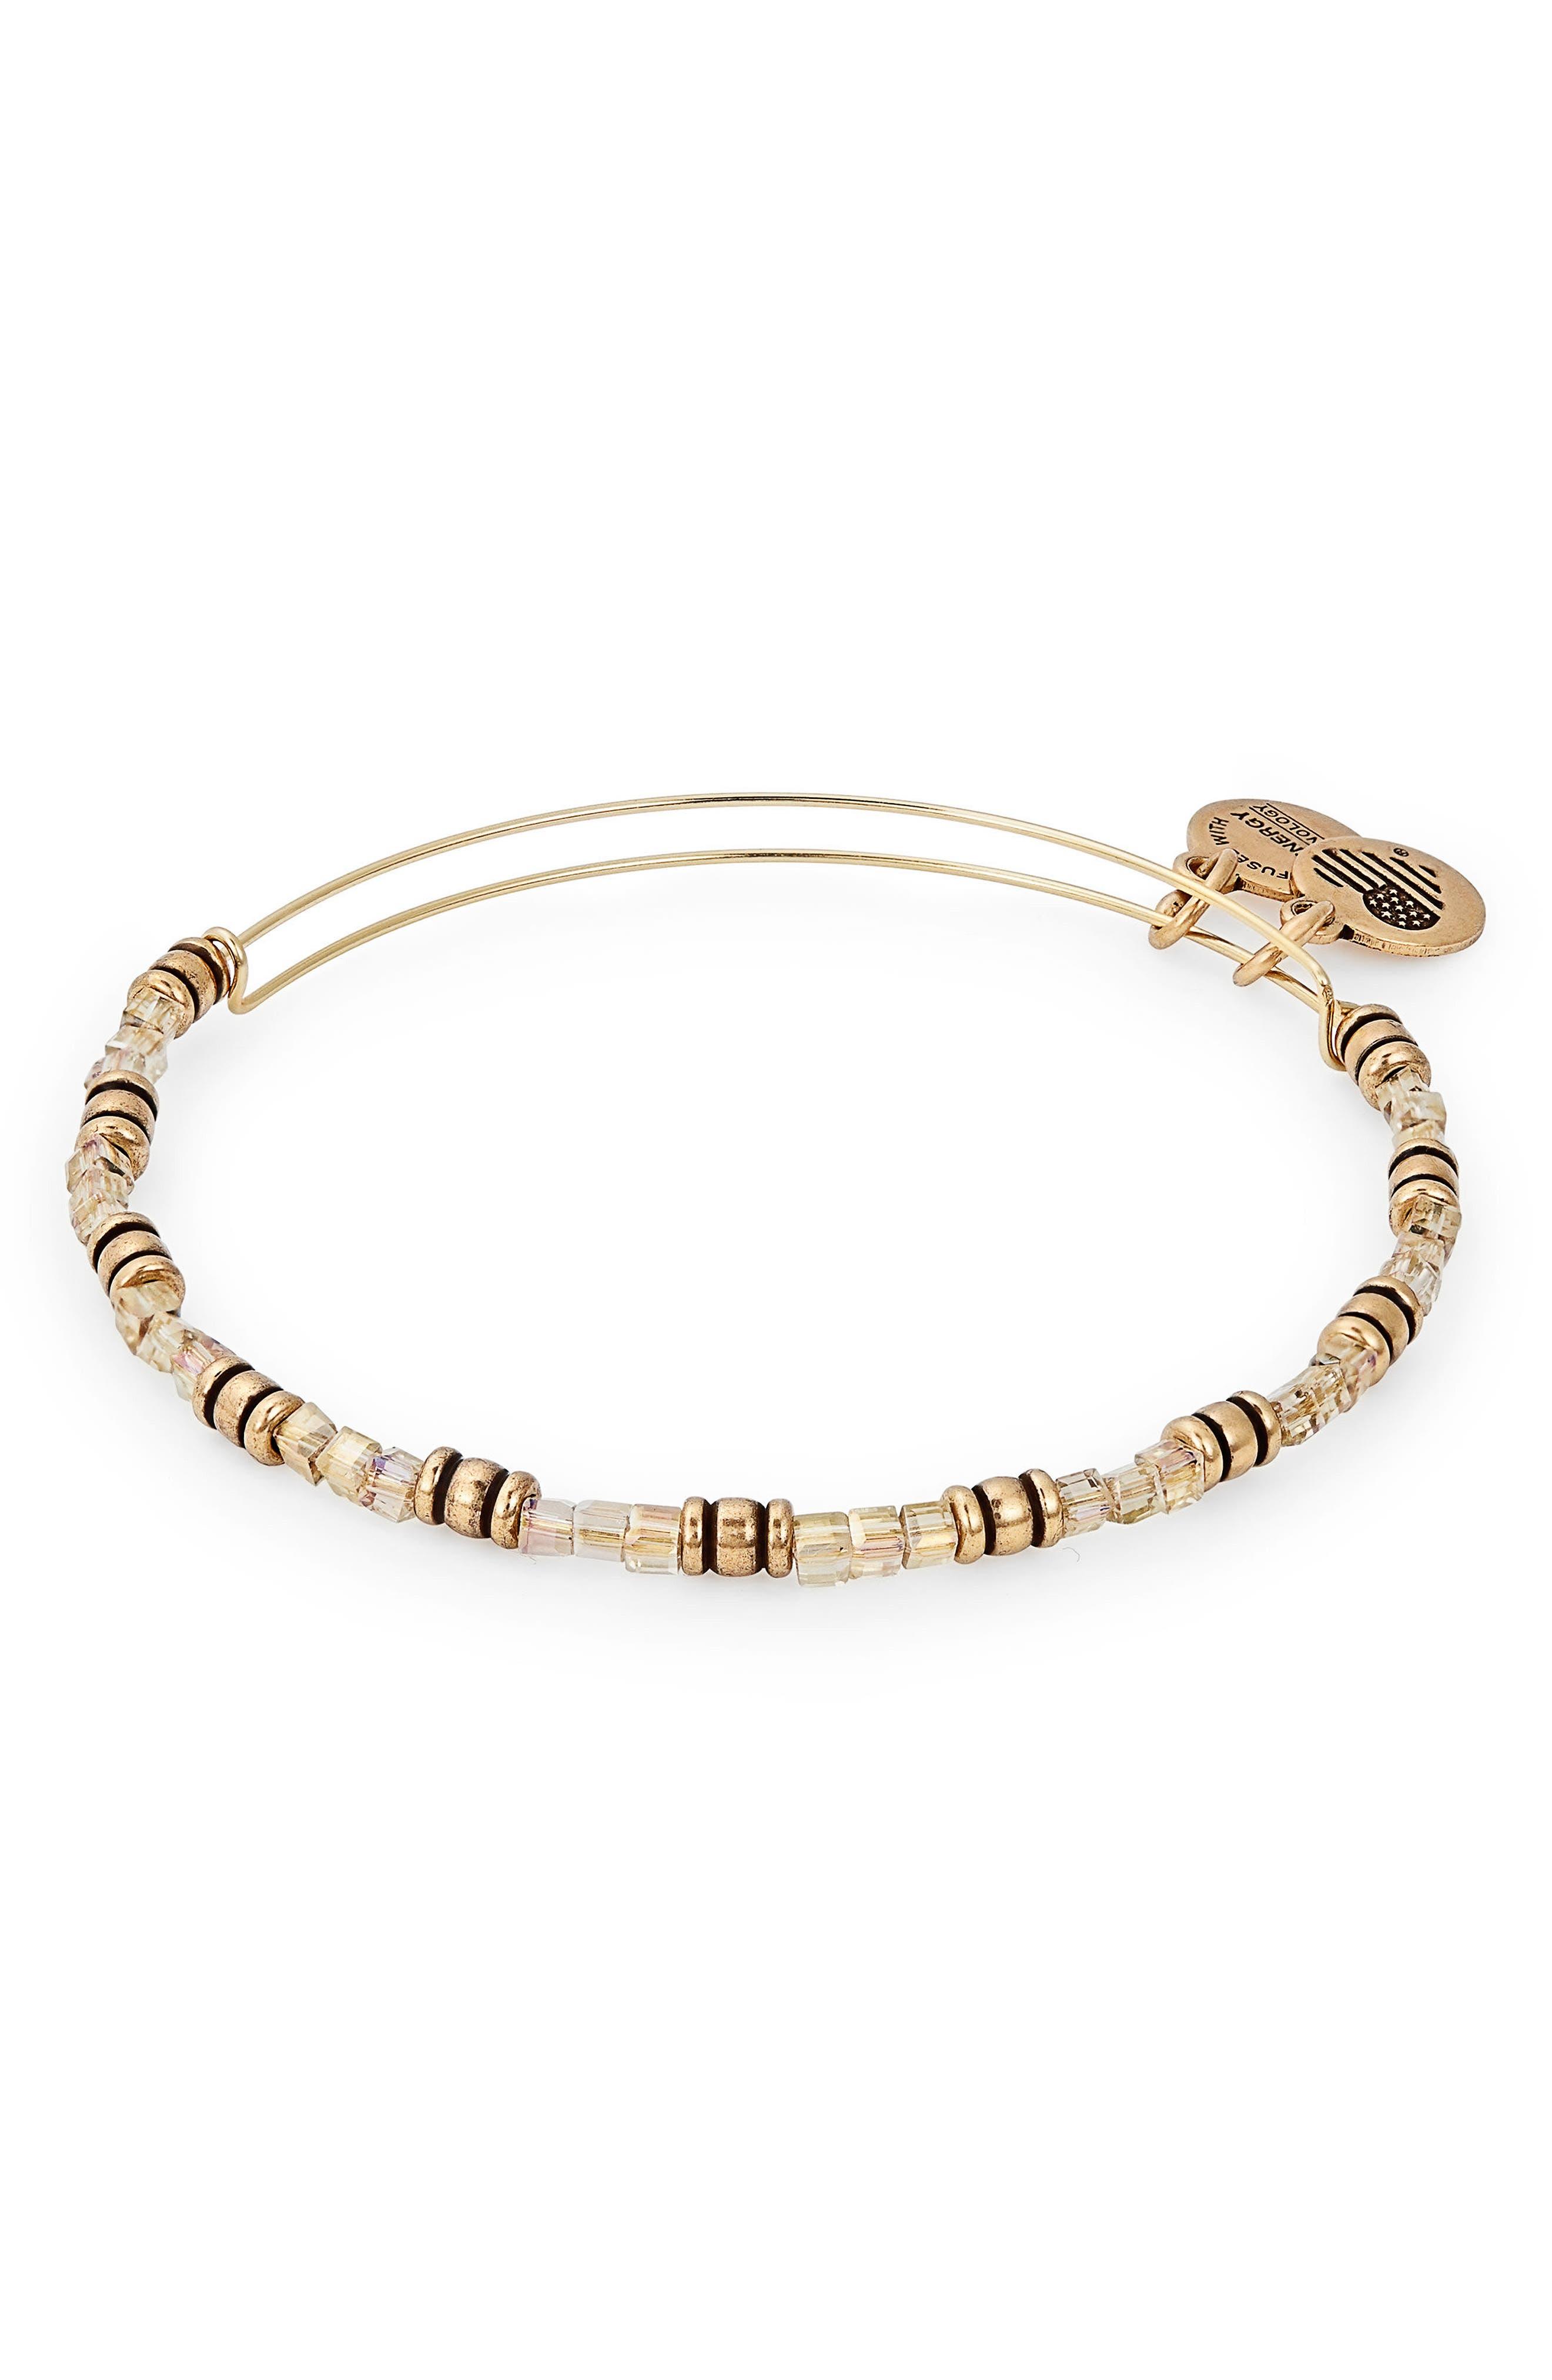 Coastal Sunlight Expandable Beaded Bracelet,                         Main,                         color, Gold